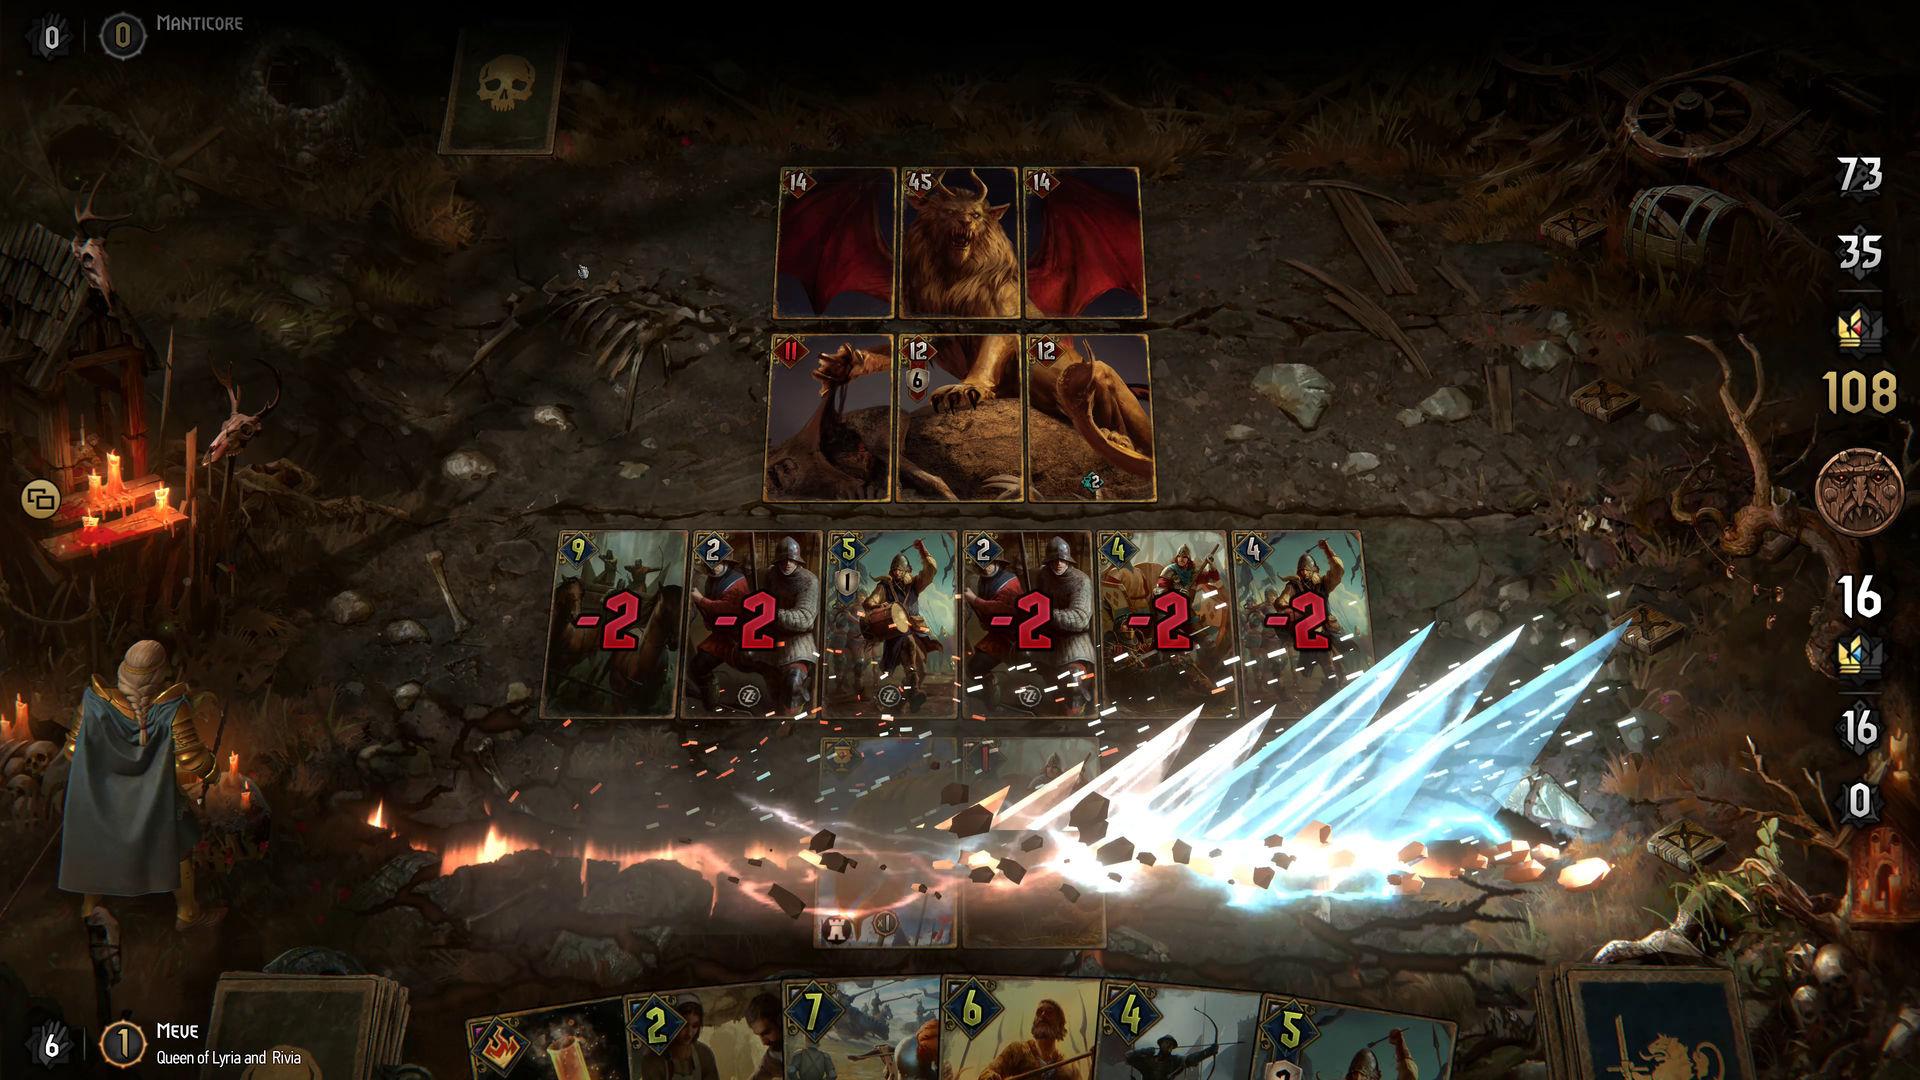 巫师之昆特牌:王权的陨落/Thronebreaker: The Witcher Tales插图